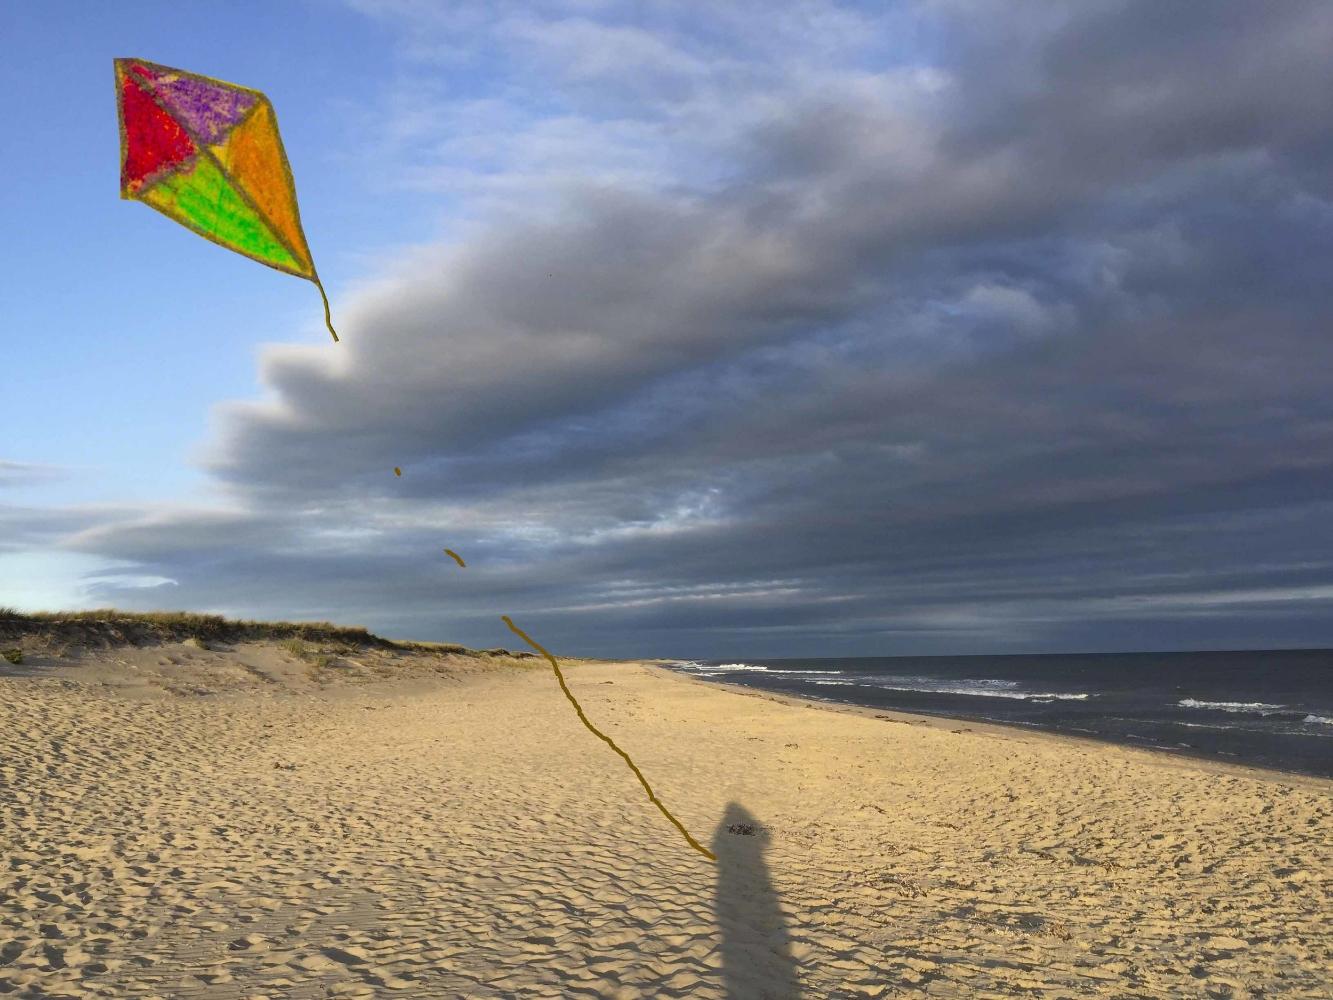 Shadow Flying a Kite